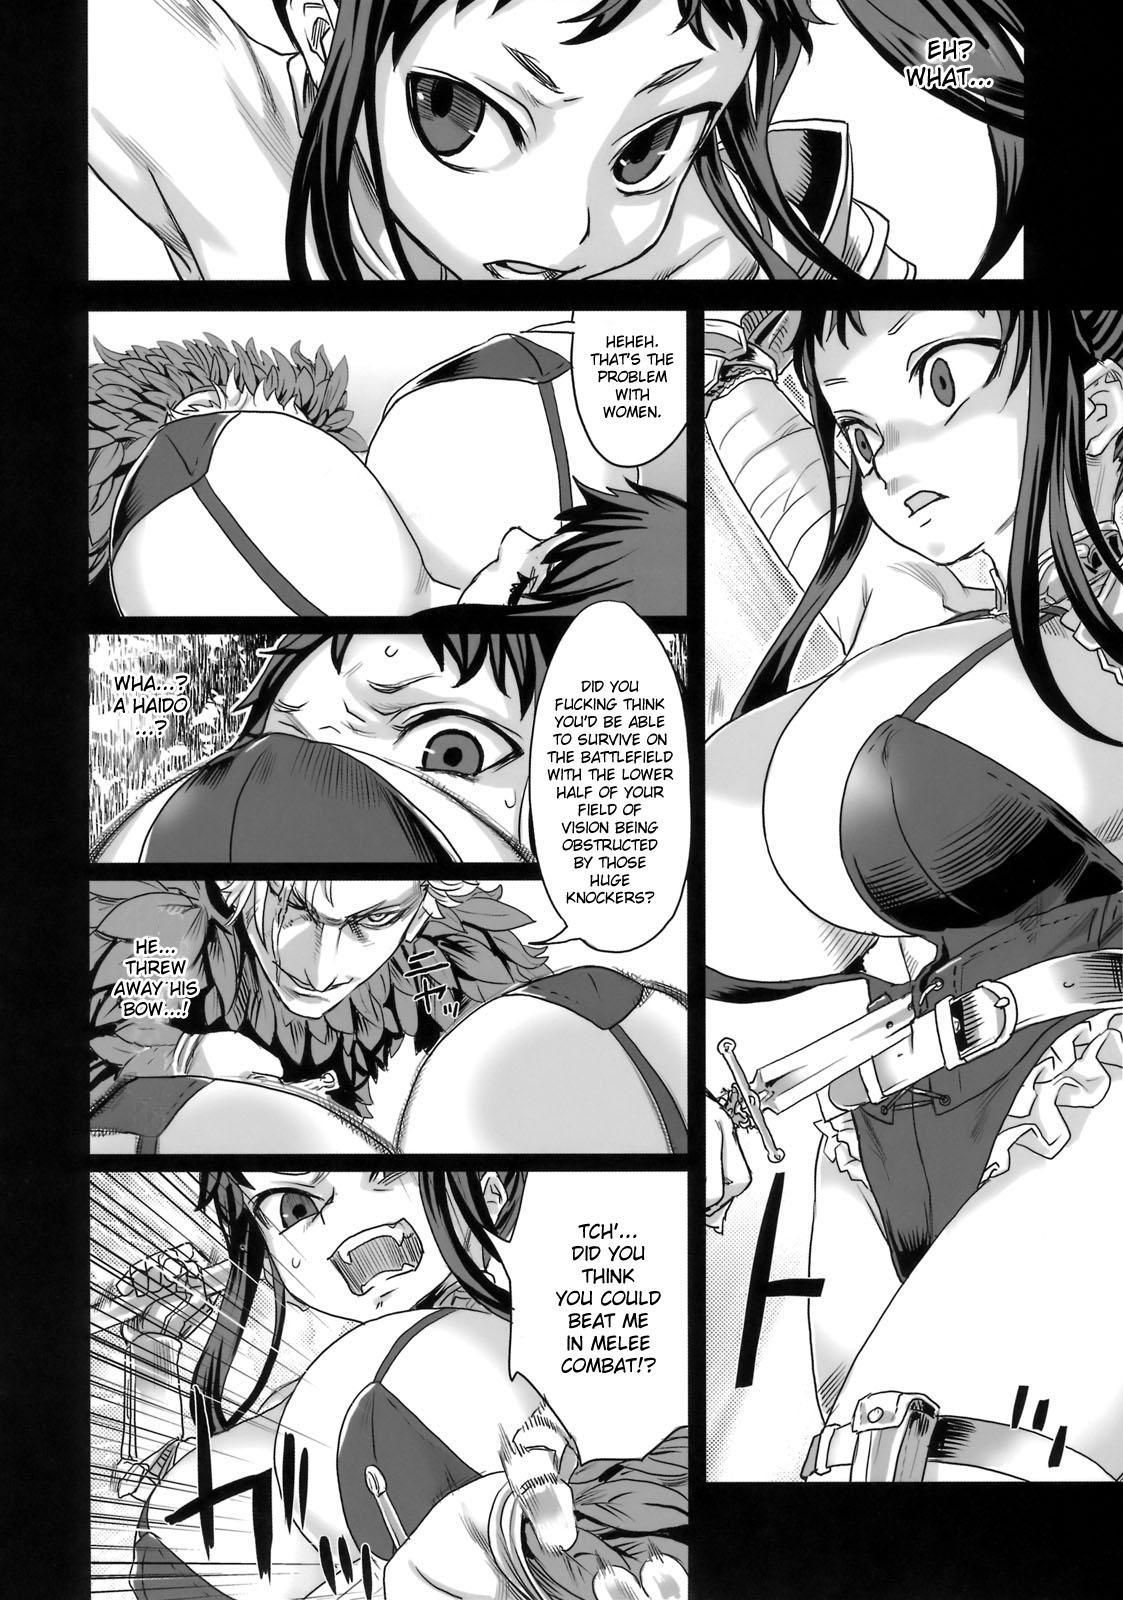 (C76) [Fatalpulse (Asanagi)] Victim Girls 7 - Jaku Niku Kyoushoku Dog-eat-Bitch (Fantasy Earth Zero) [English] [desudesu] 4